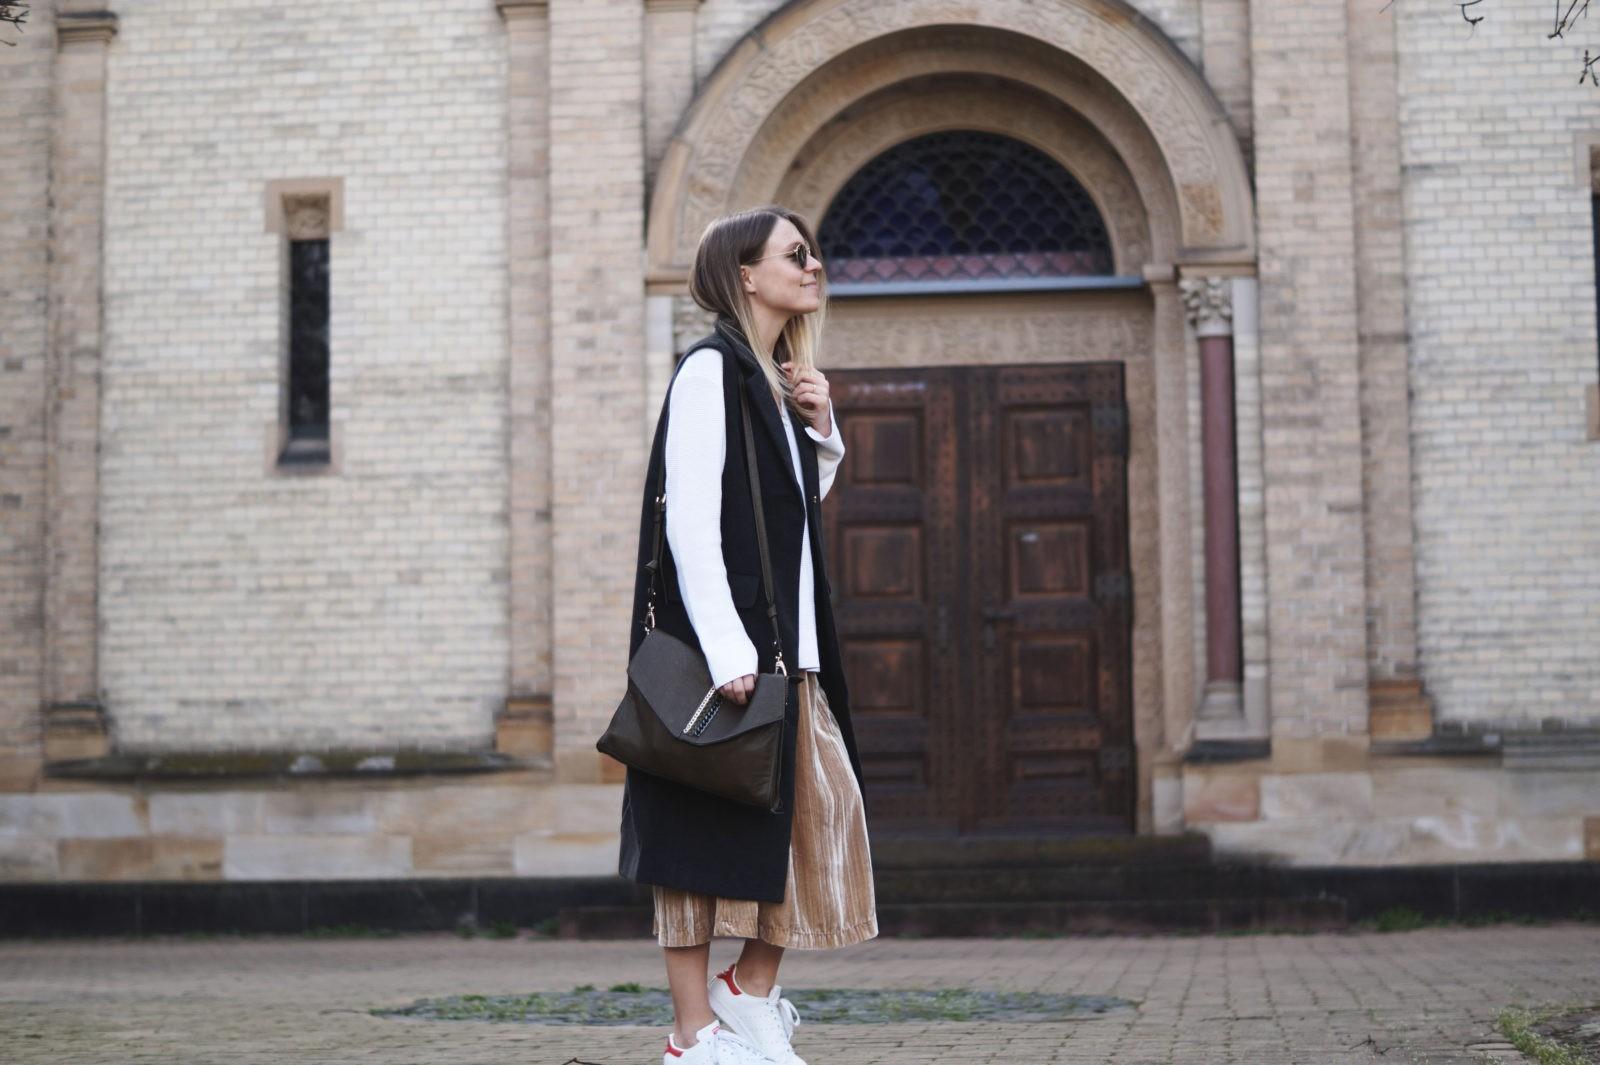 Velvet Midi Skirt Samtrock H&M Streetstyle Outfit Spring Look Frühling Layers Layering Adidas Stan Smith Ray Ban Round Metal Fashionblogger Sariety Modeblog Heidelberg Posing Outfitshoot